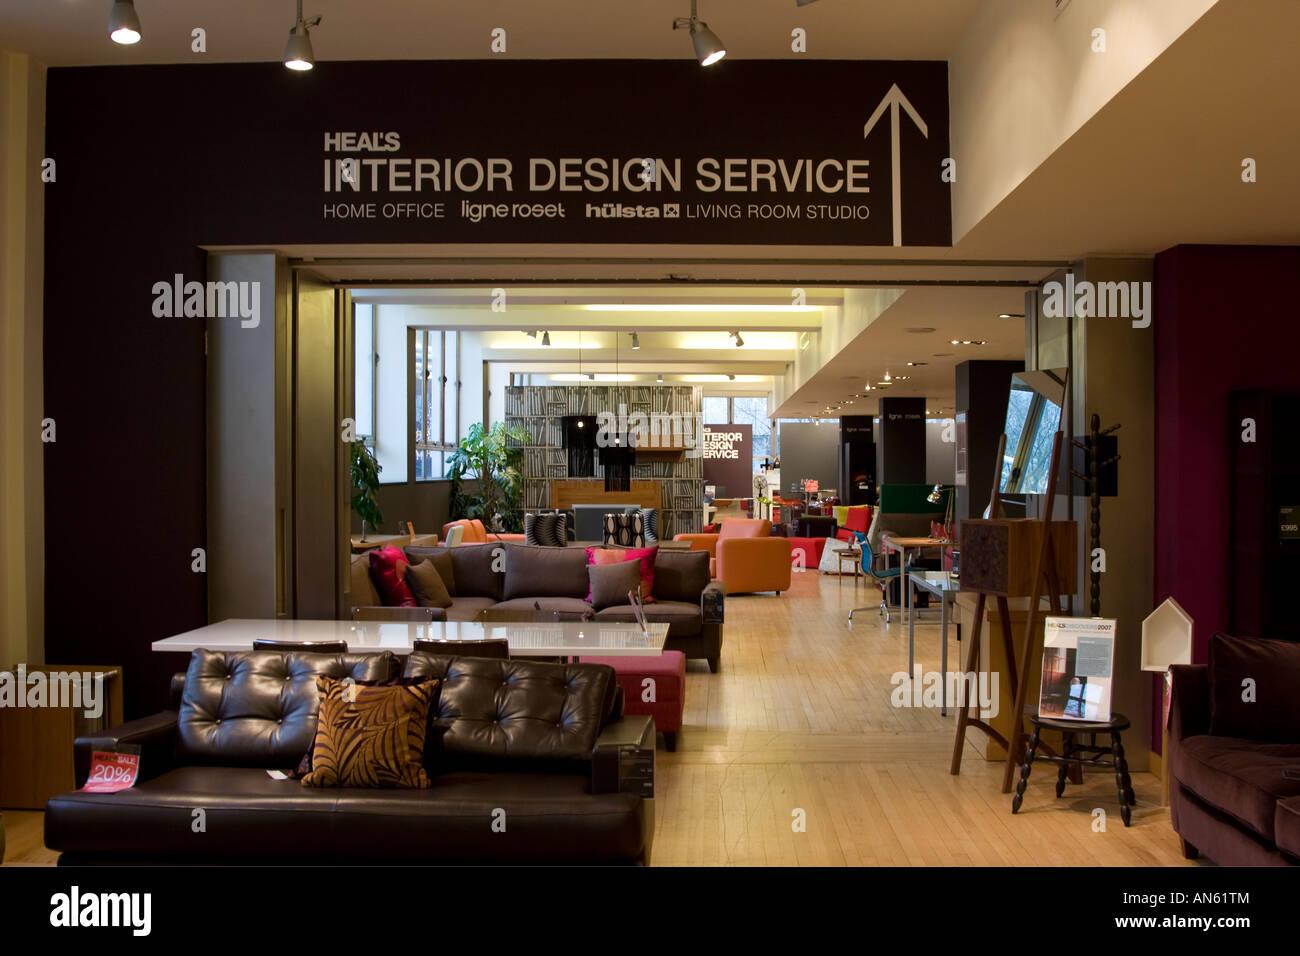 Heals Furniture Department Store - Tottenham Court Road - London ... | heals furniture store